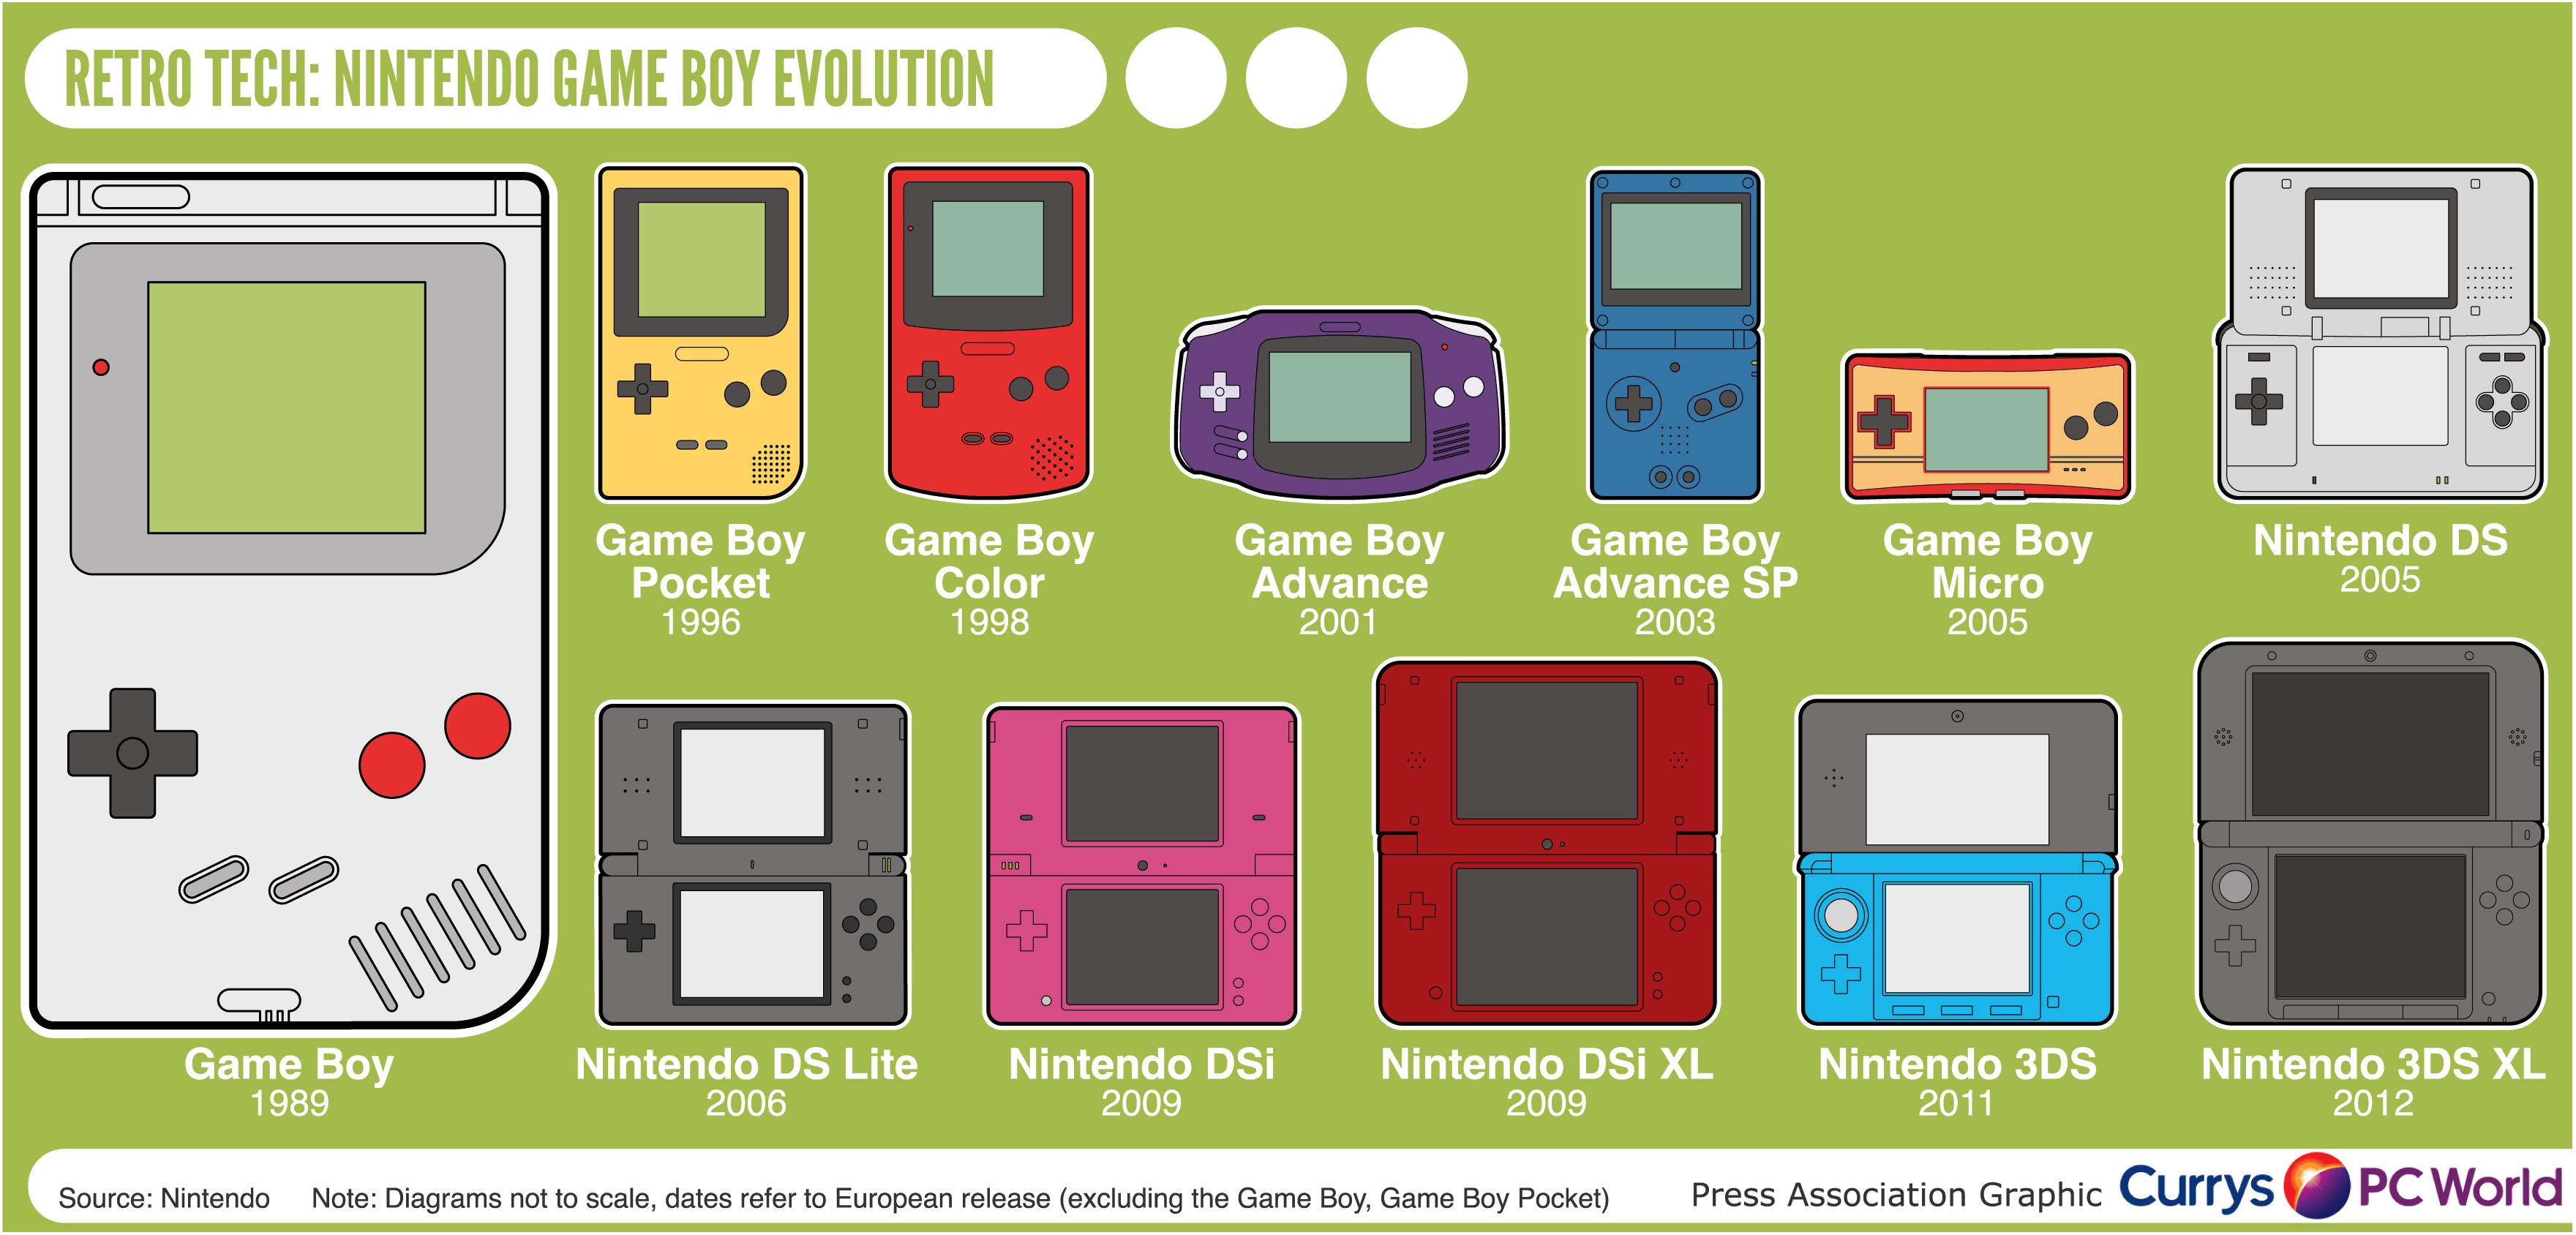 Retro Tech Nintendo Game Boy Evolution